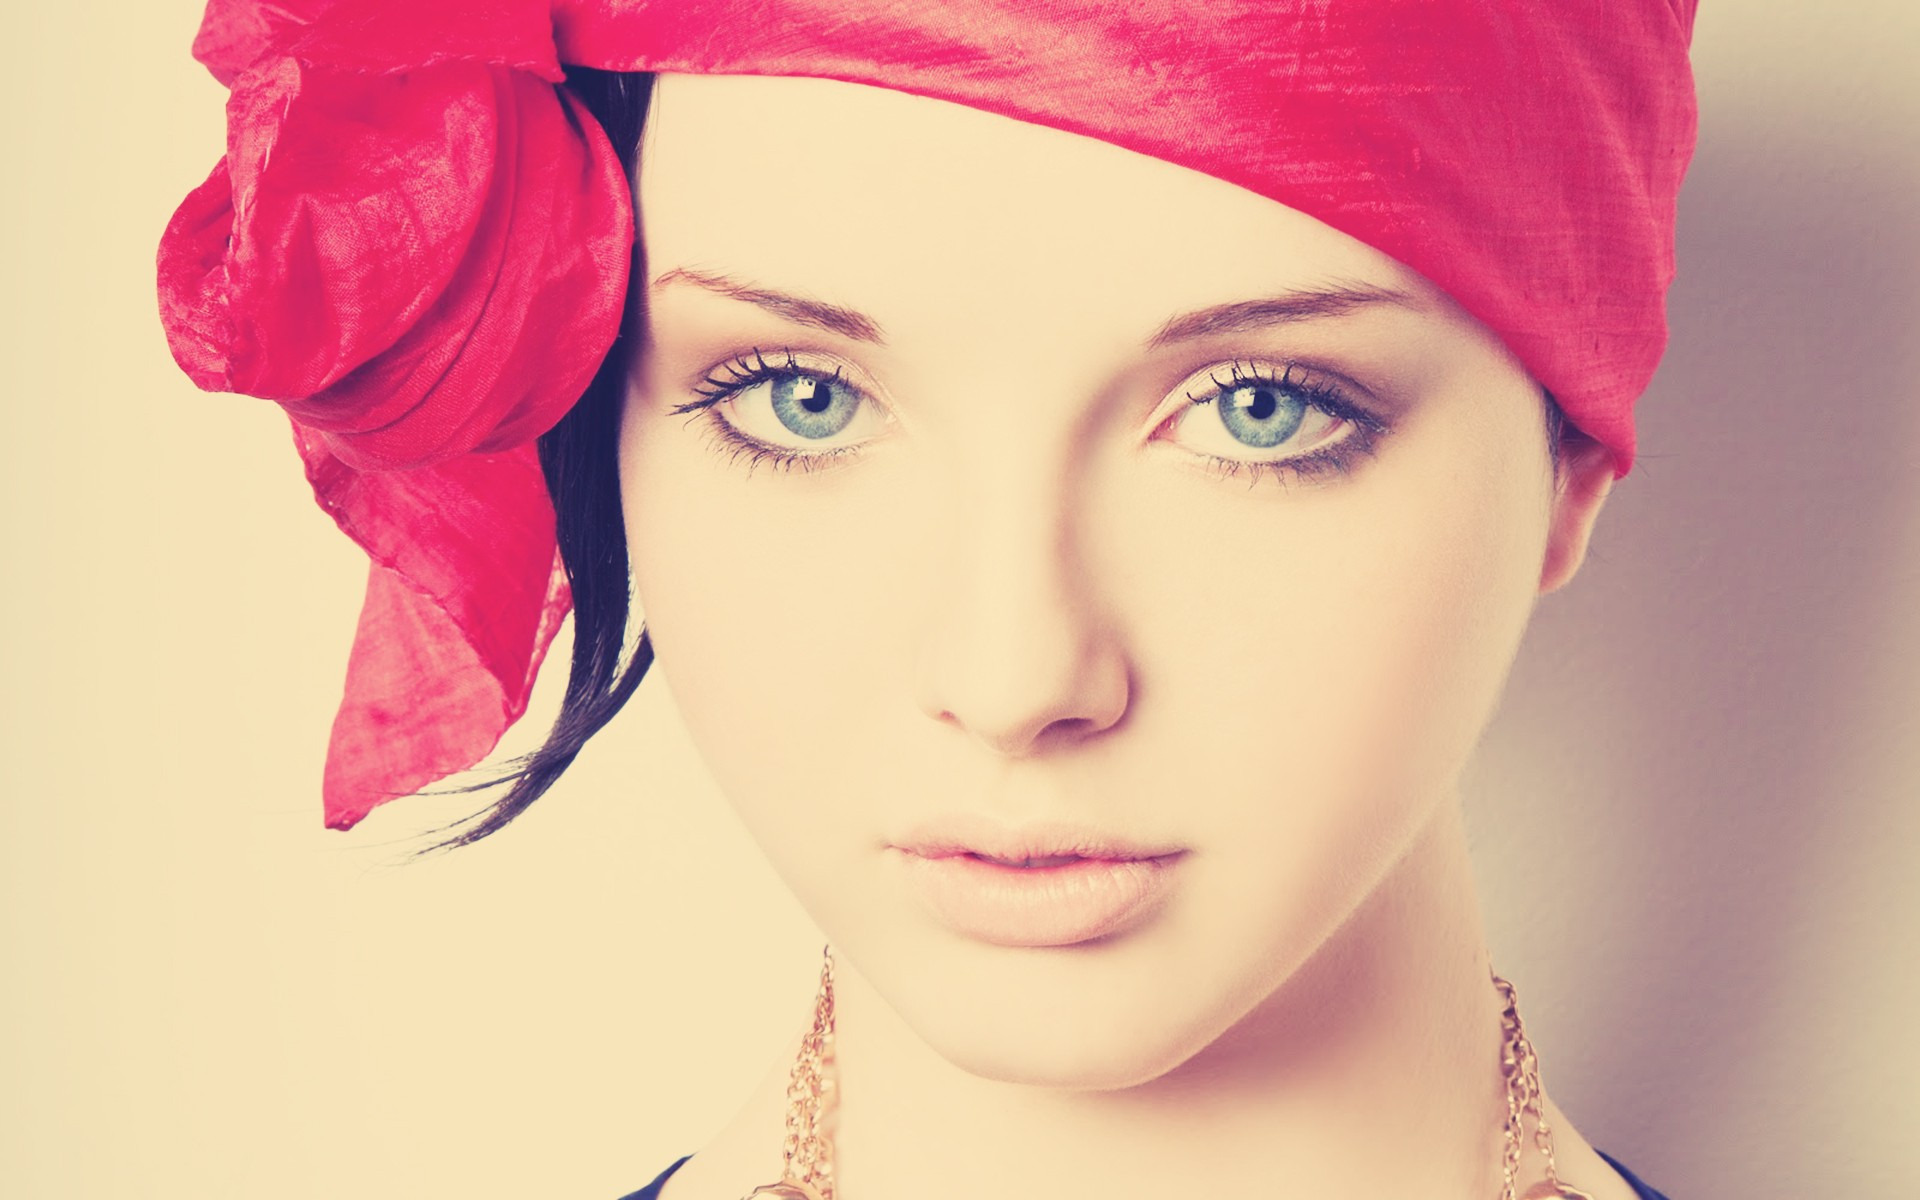 Iona Rose